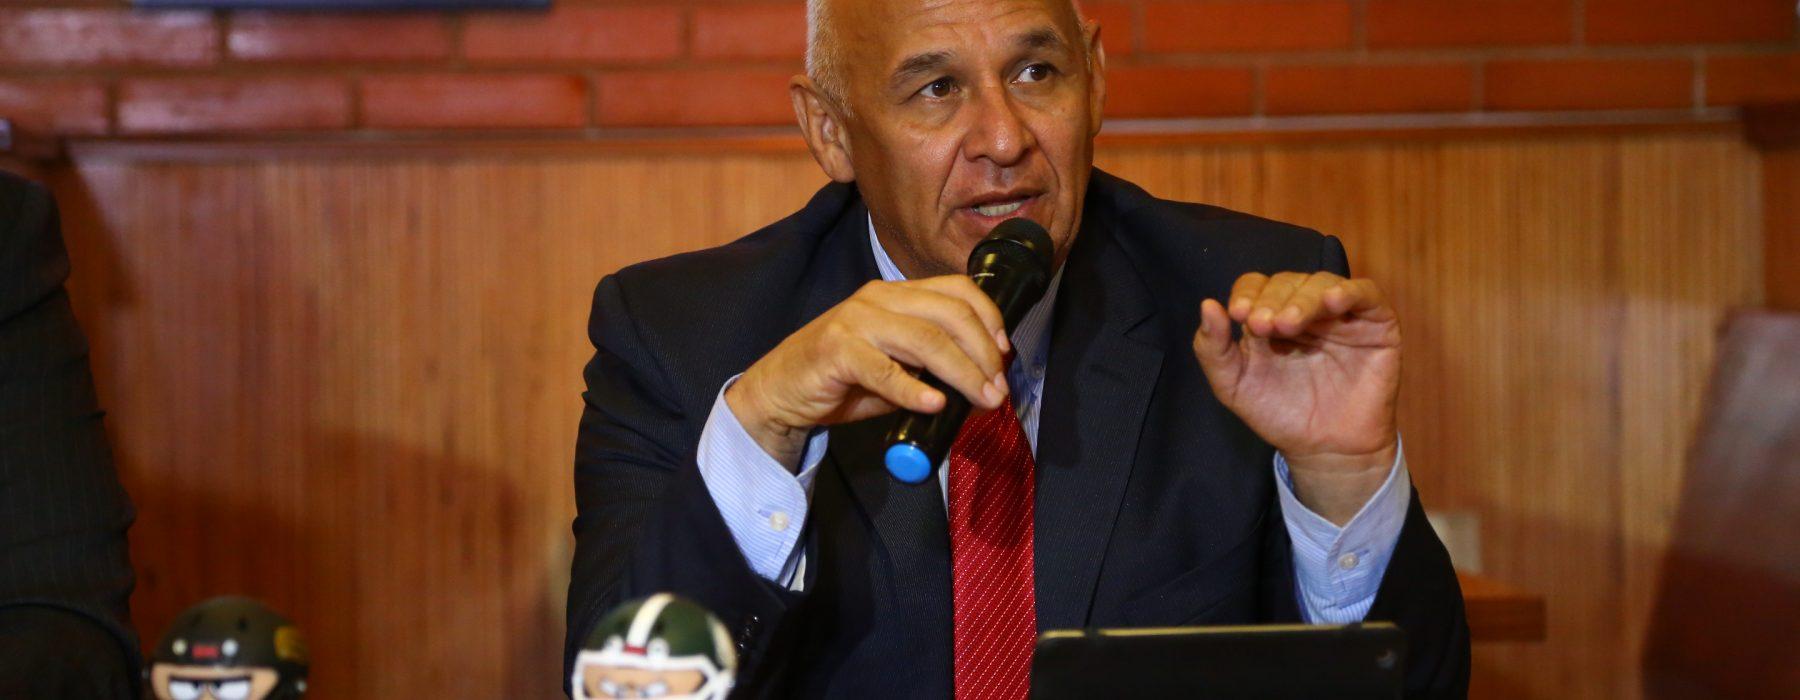 José Antonio Sandoval